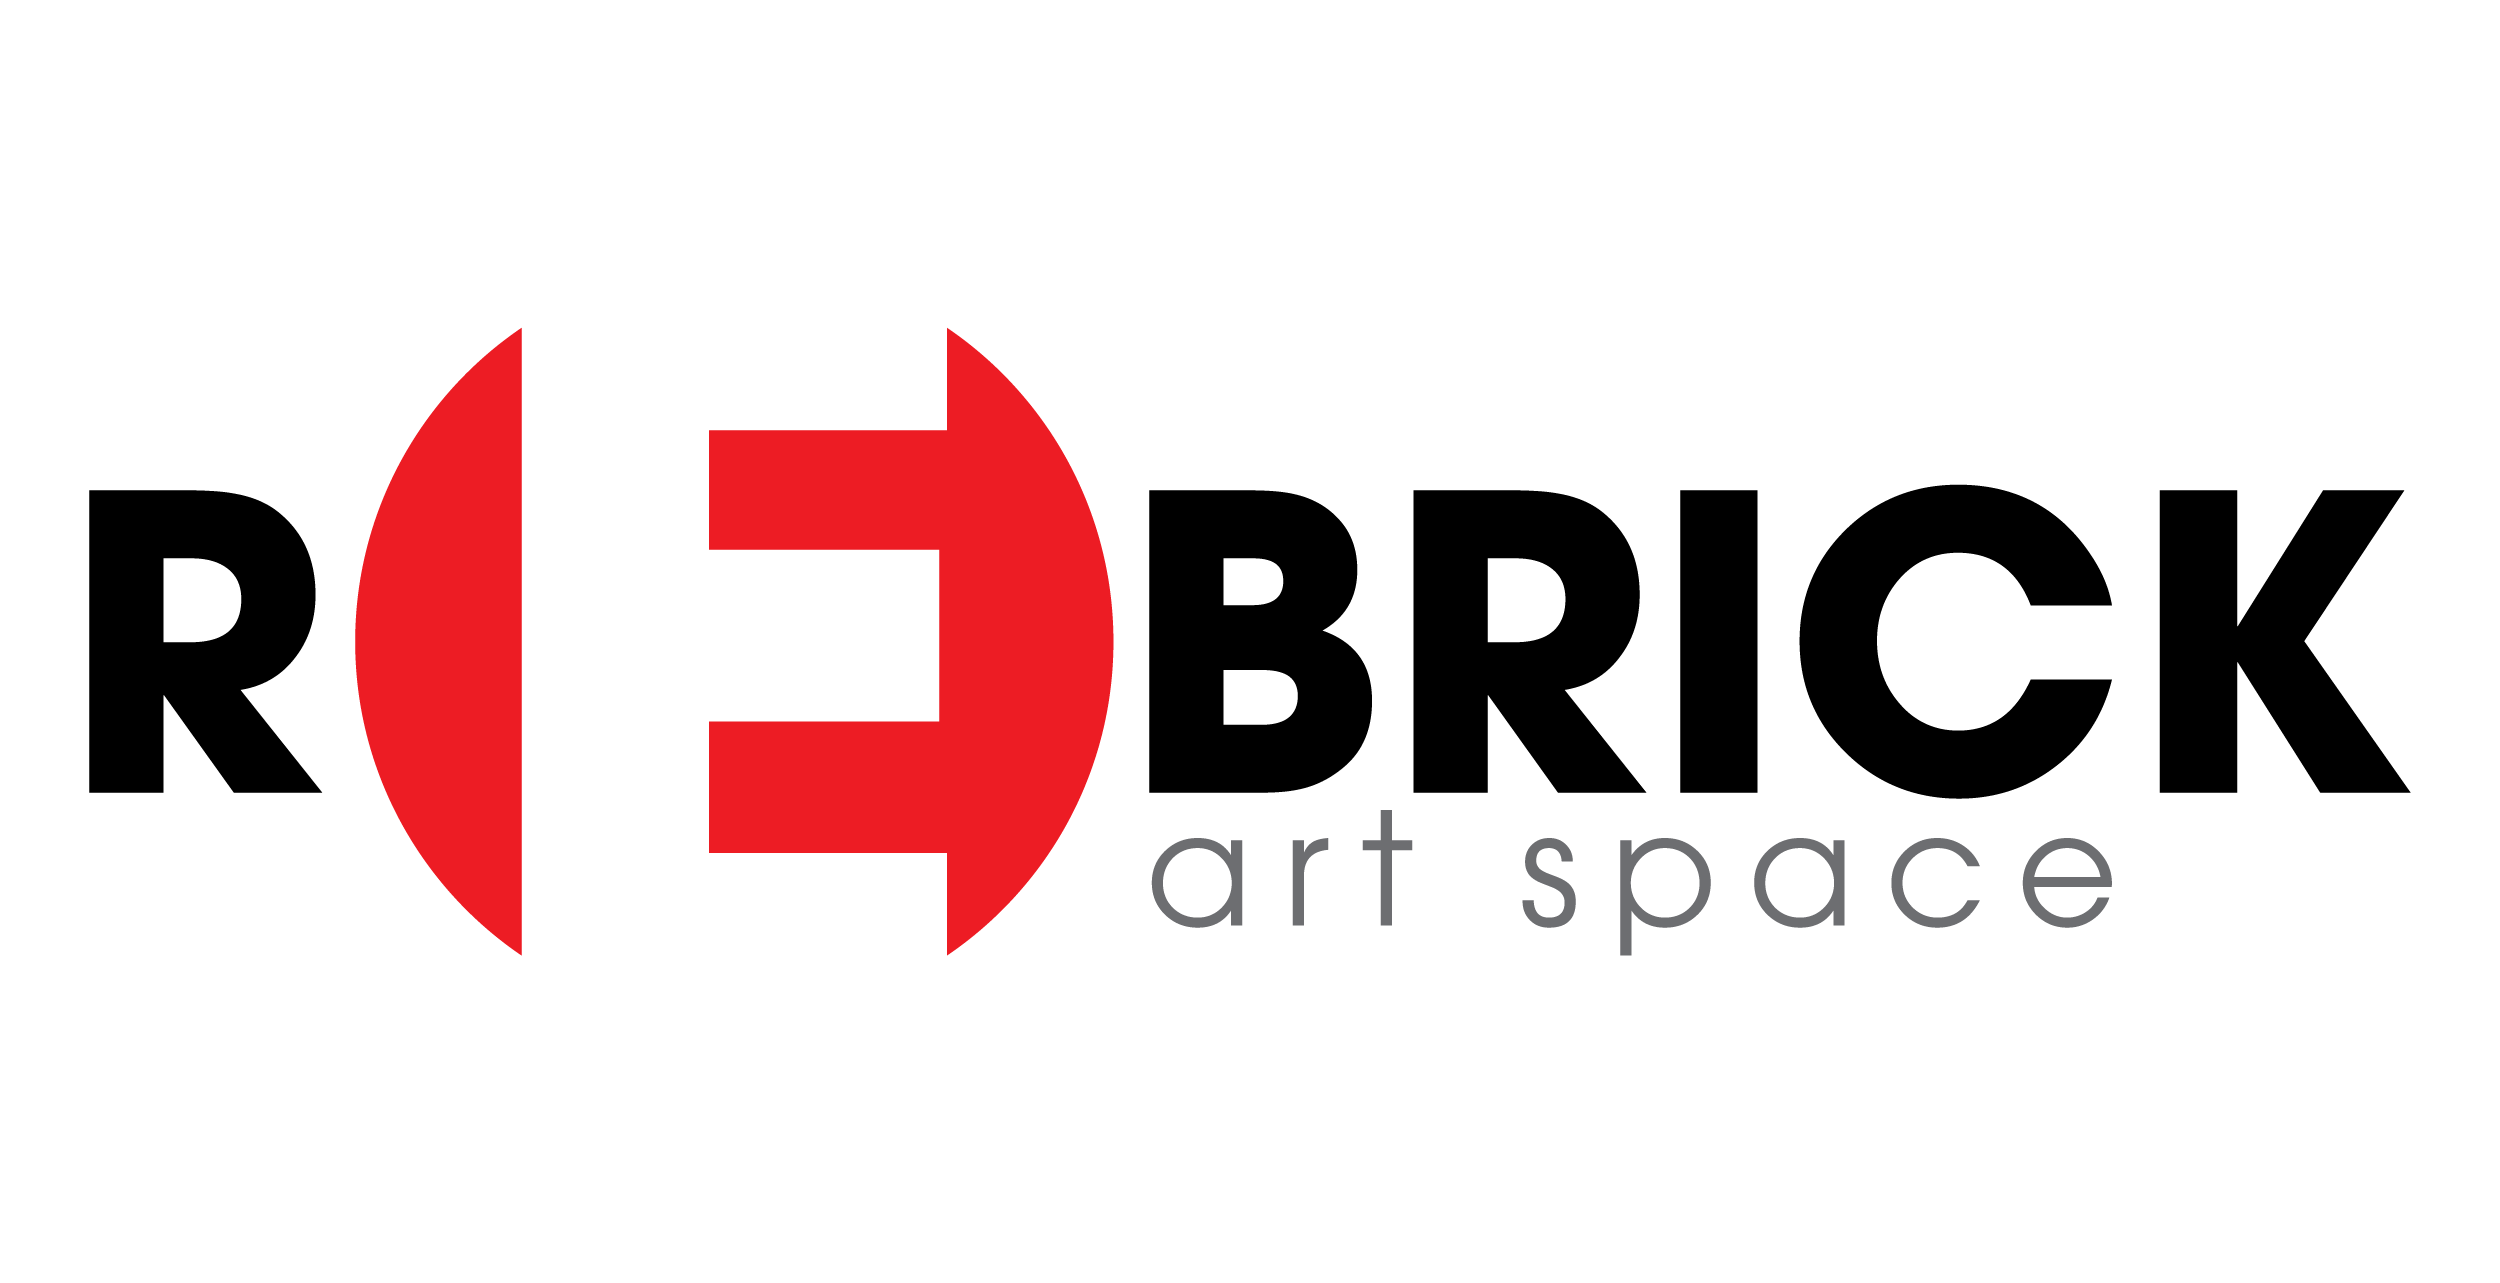 RedBrick Art Space